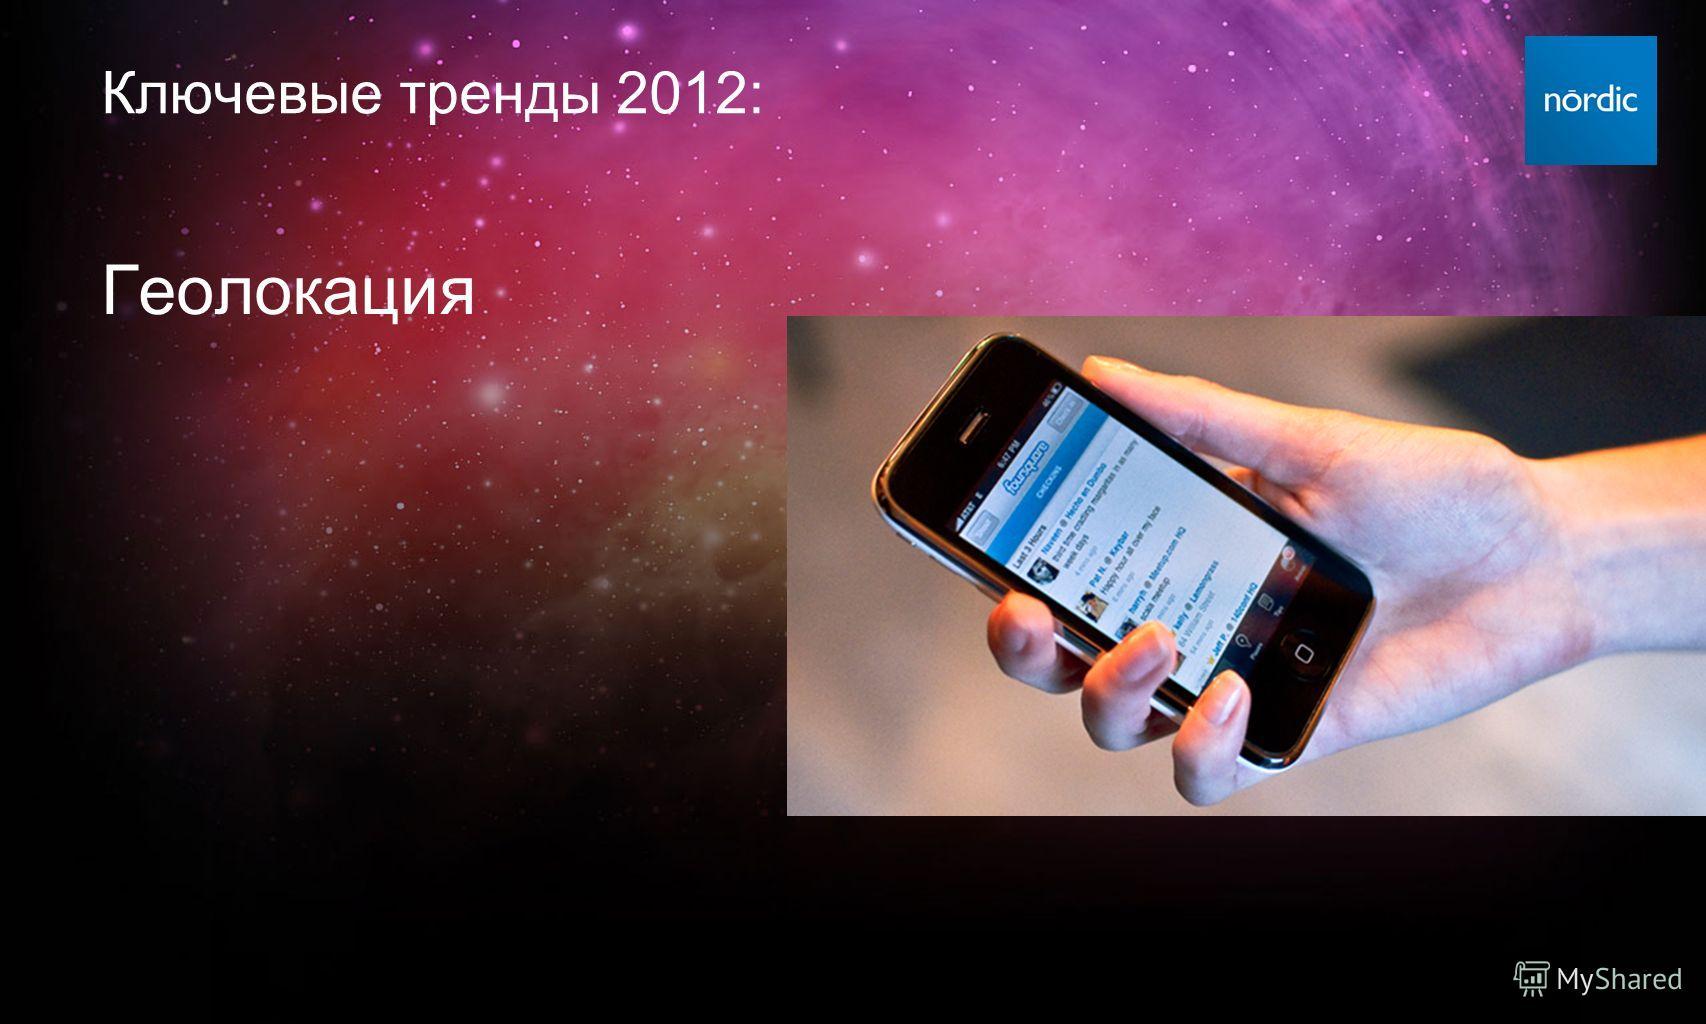 Ключевые тренды 2012: Геолокация